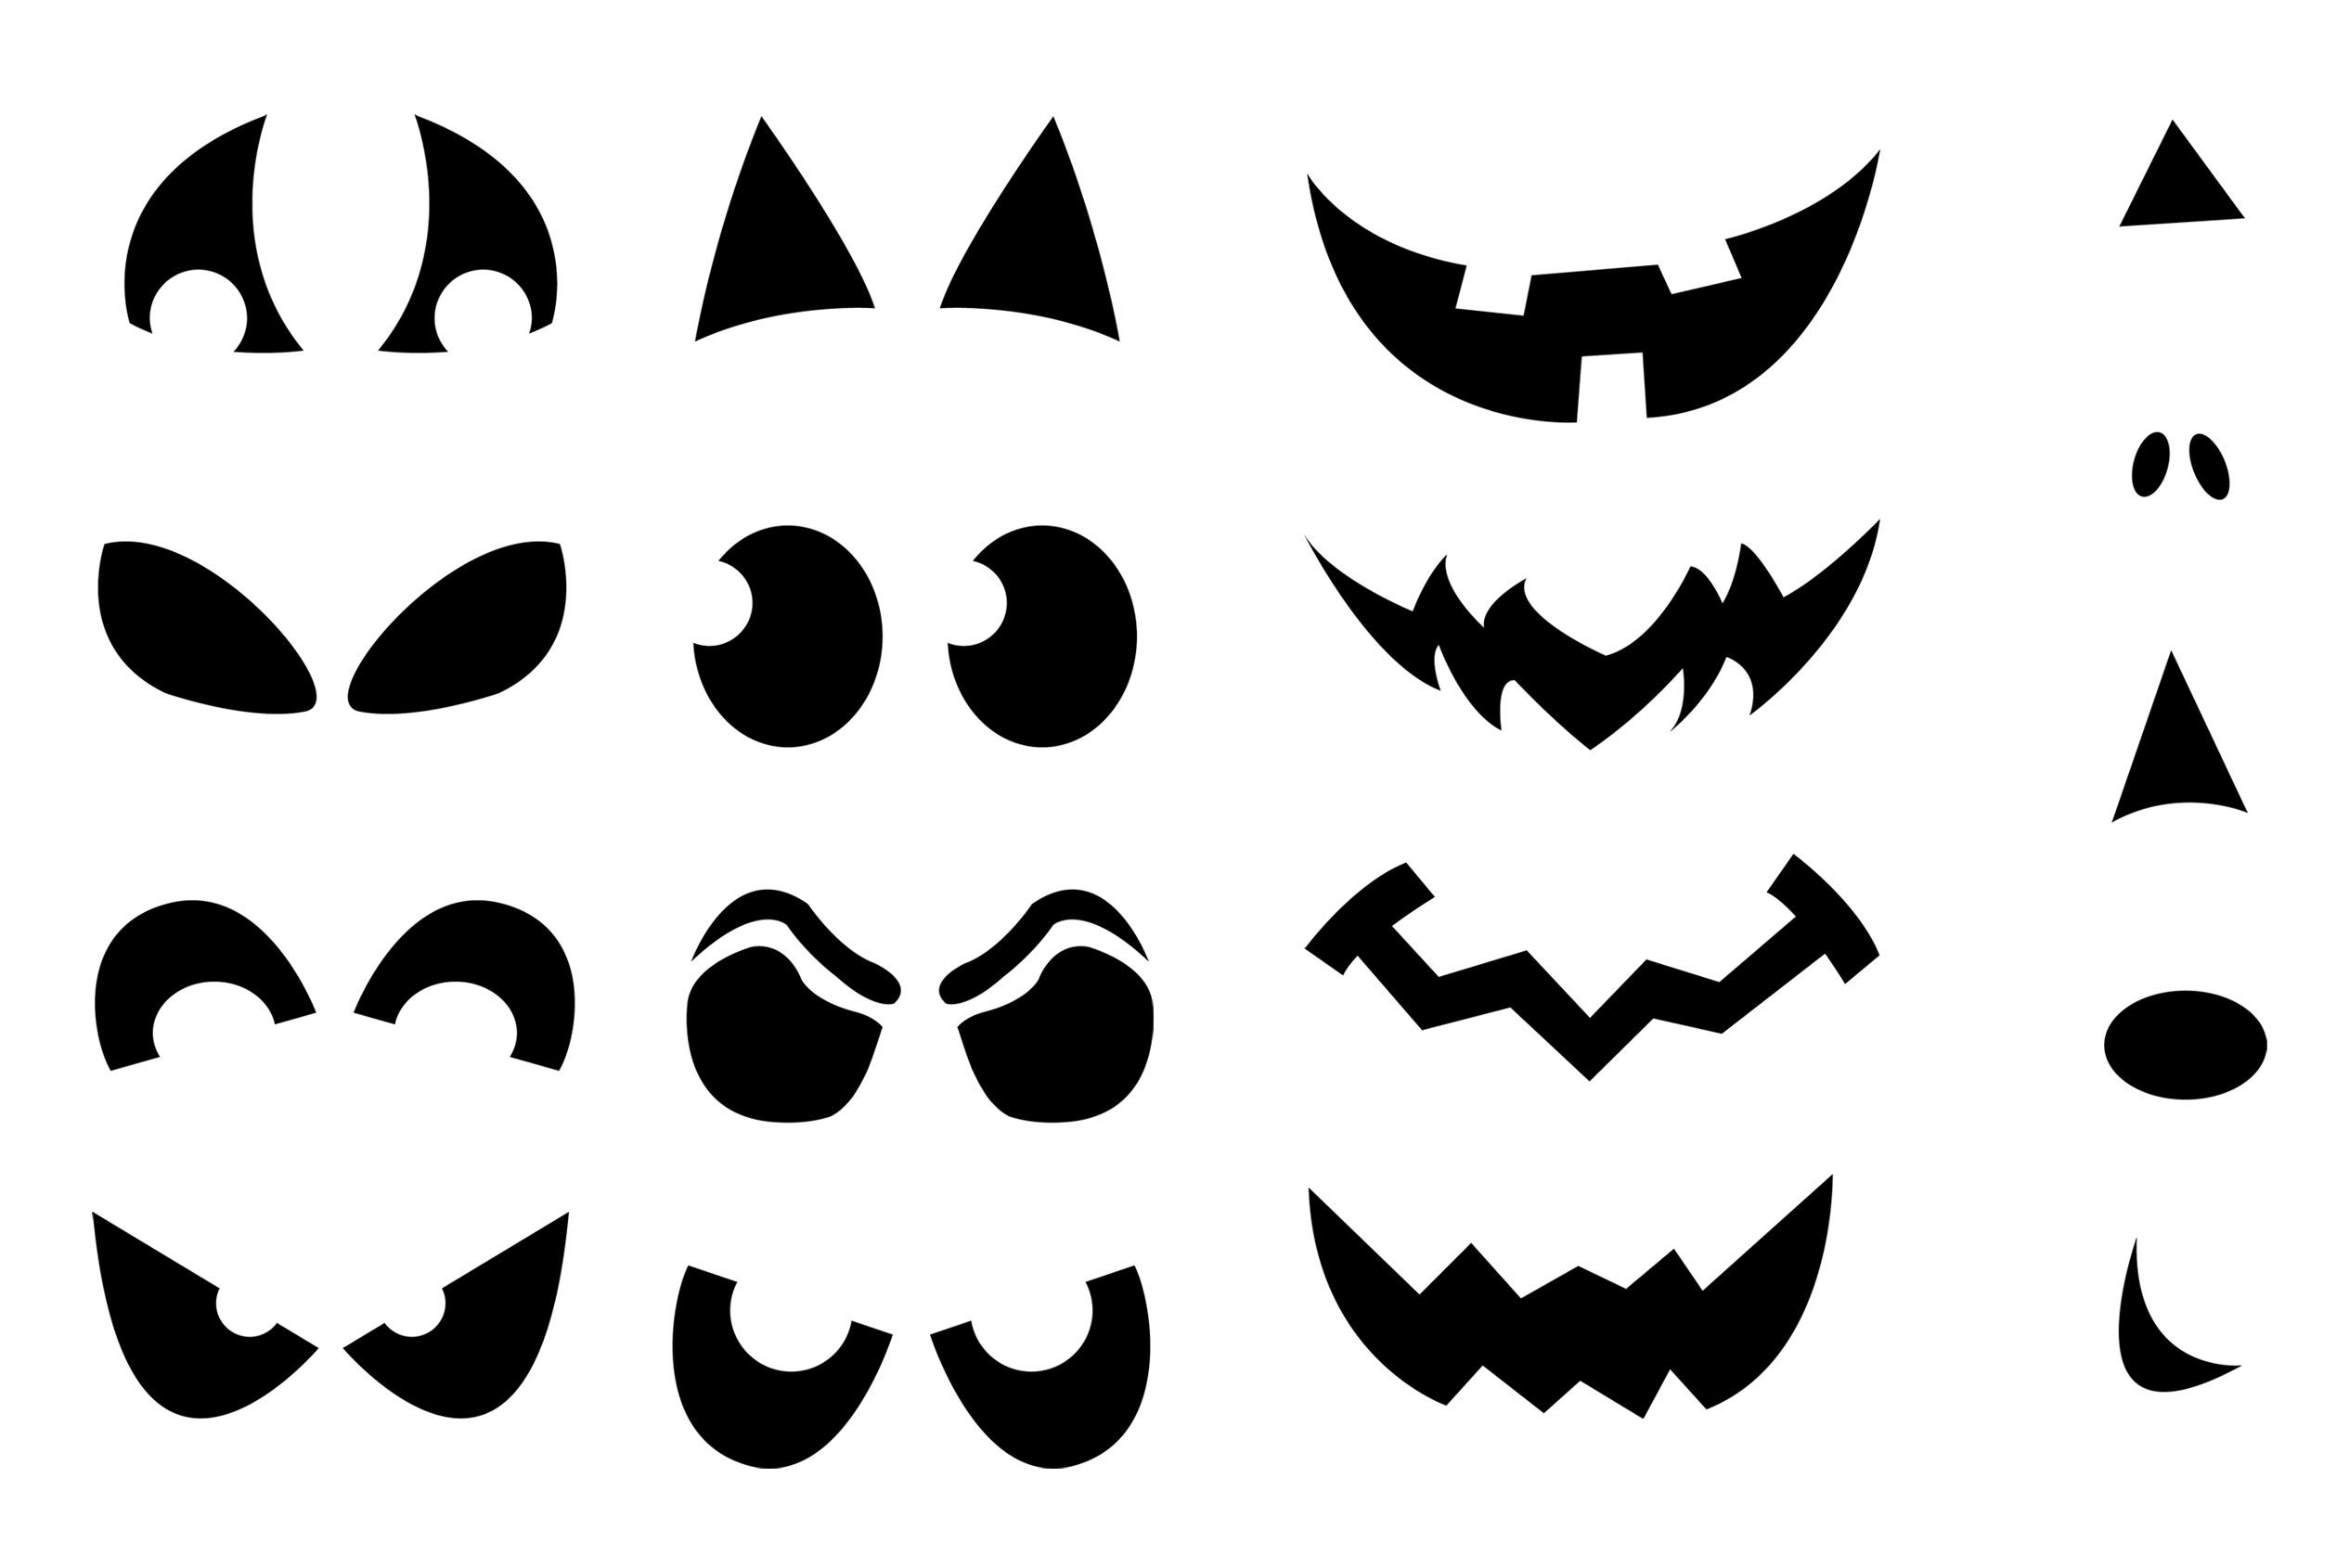 Jack-O'-Lantern Shirt Stencils   Craft Buds - Jack O Lantern Templates Printable Free